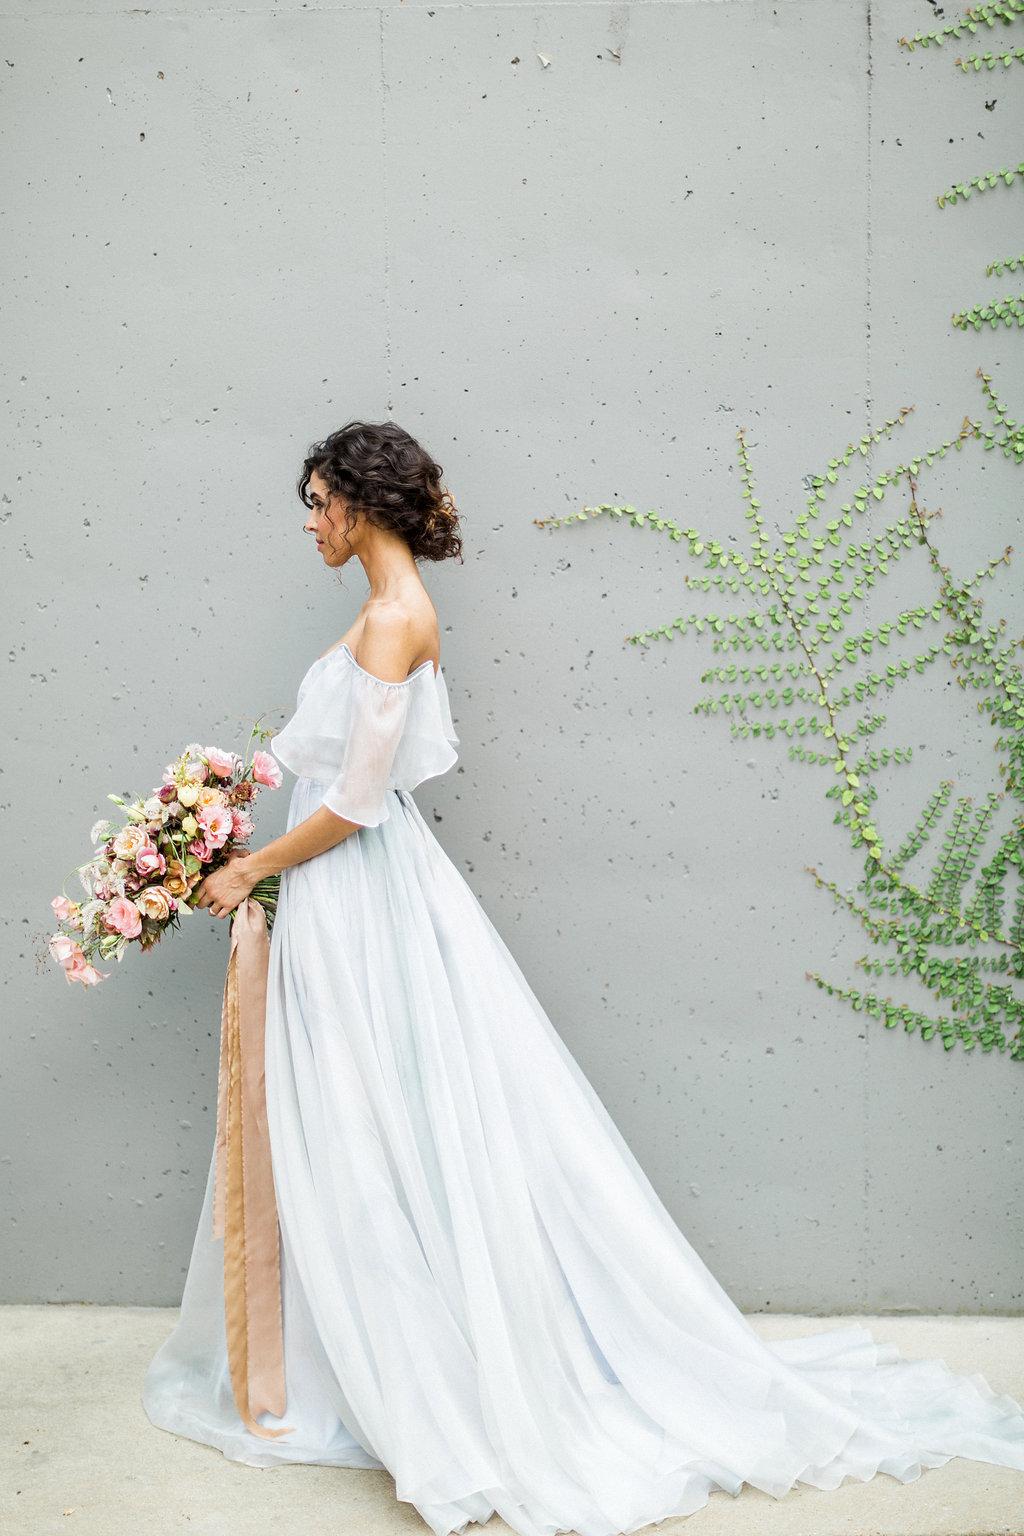 romantic bridal inspiration with a blue wedding dress - https://ruffledblog.com/cloudy-day-wedding-inspiration-with-a-hand-painted-bridal-gown